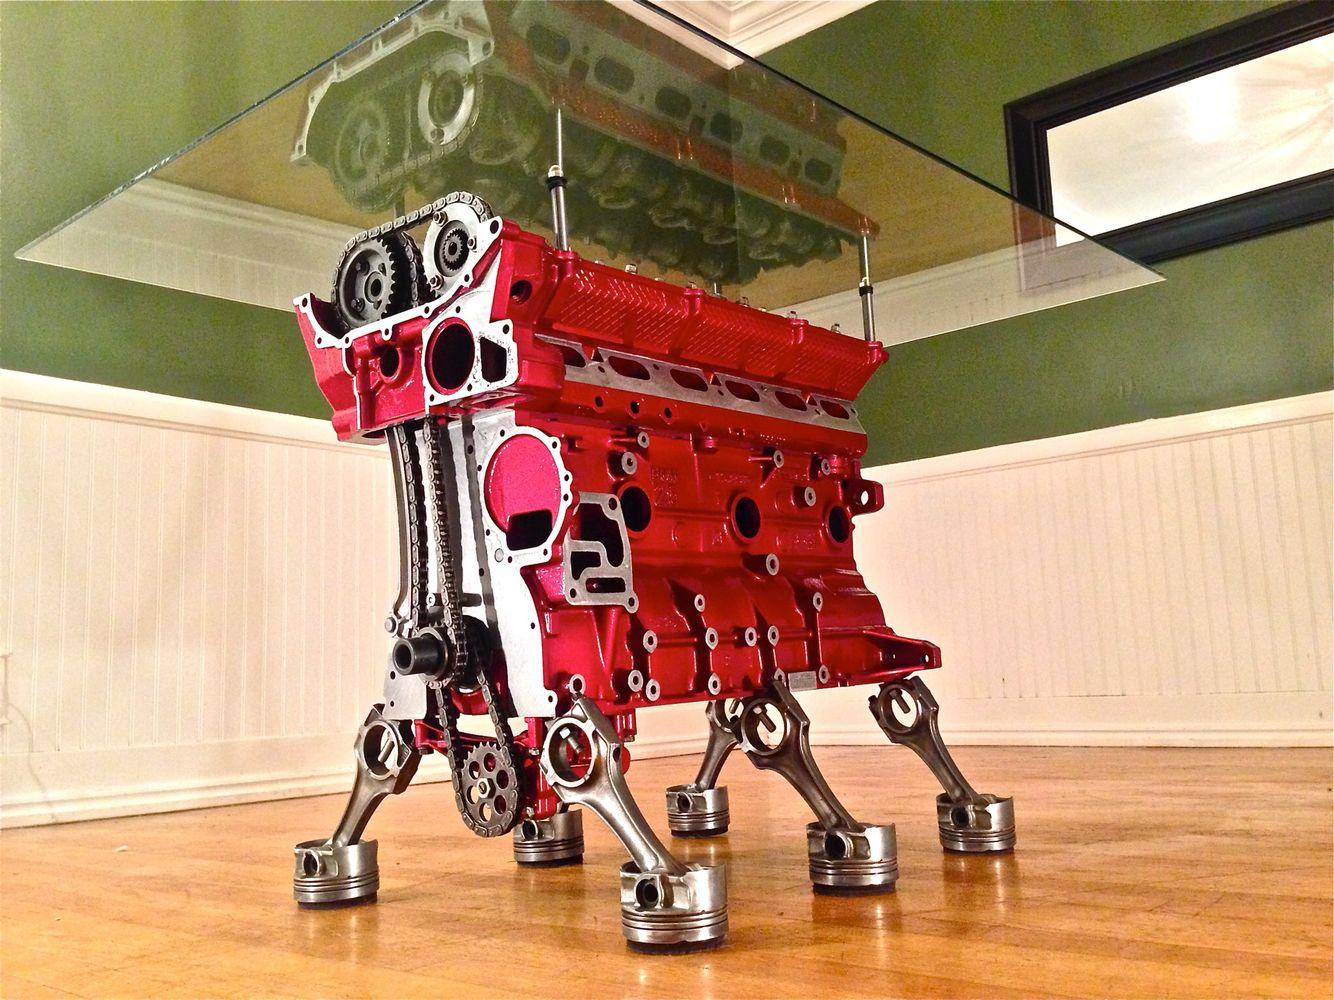 15 best engine block tables images on pinterest | engine block